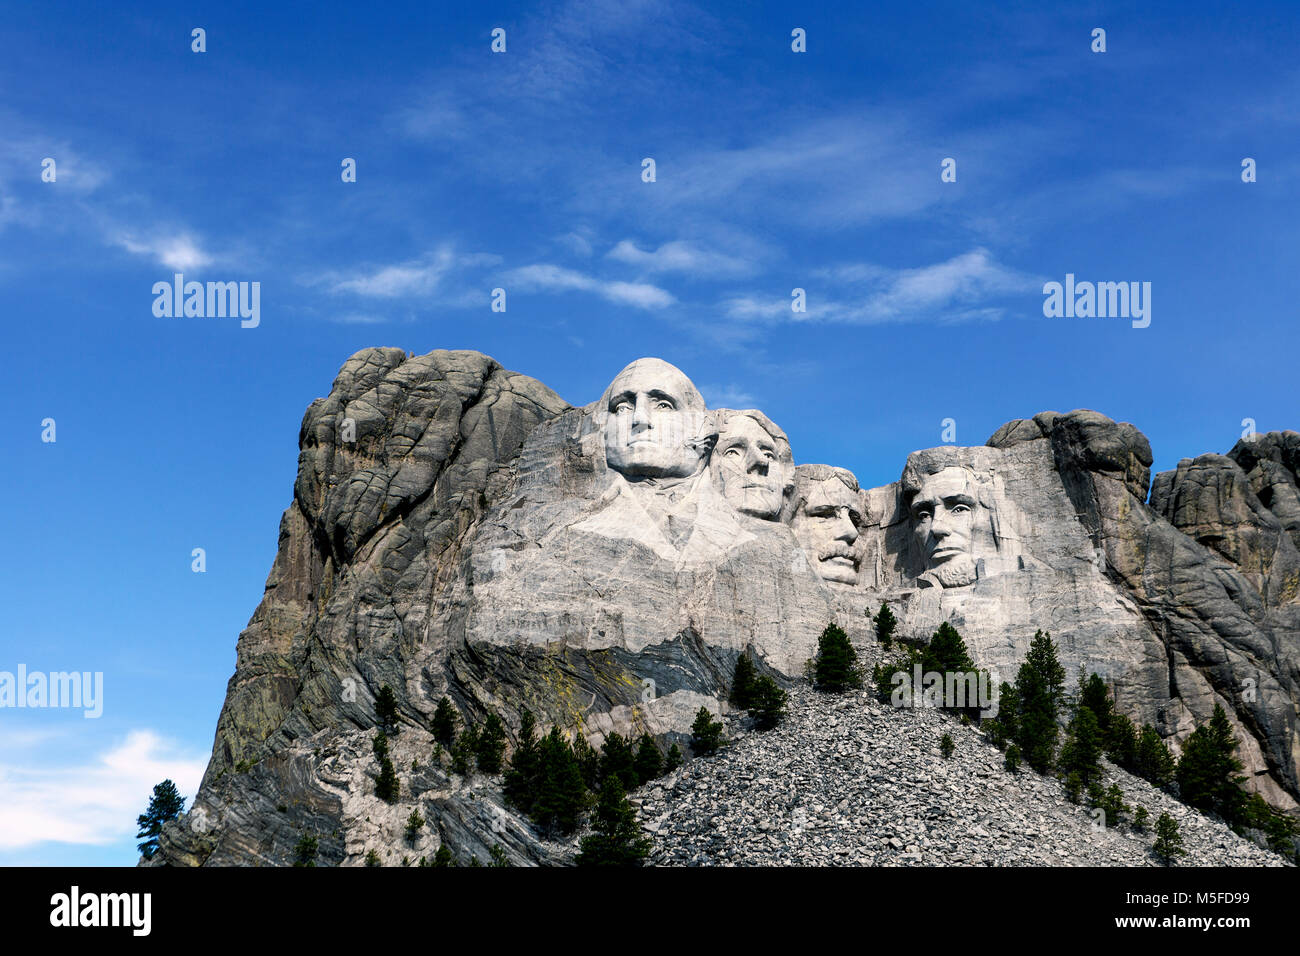 00028-00 SD...LE DAKOTA DU SUD - Presedents Georg Washington, Thomas Jefferson, Theodore Roosevelt et Abraham Lincoln Photo Stock